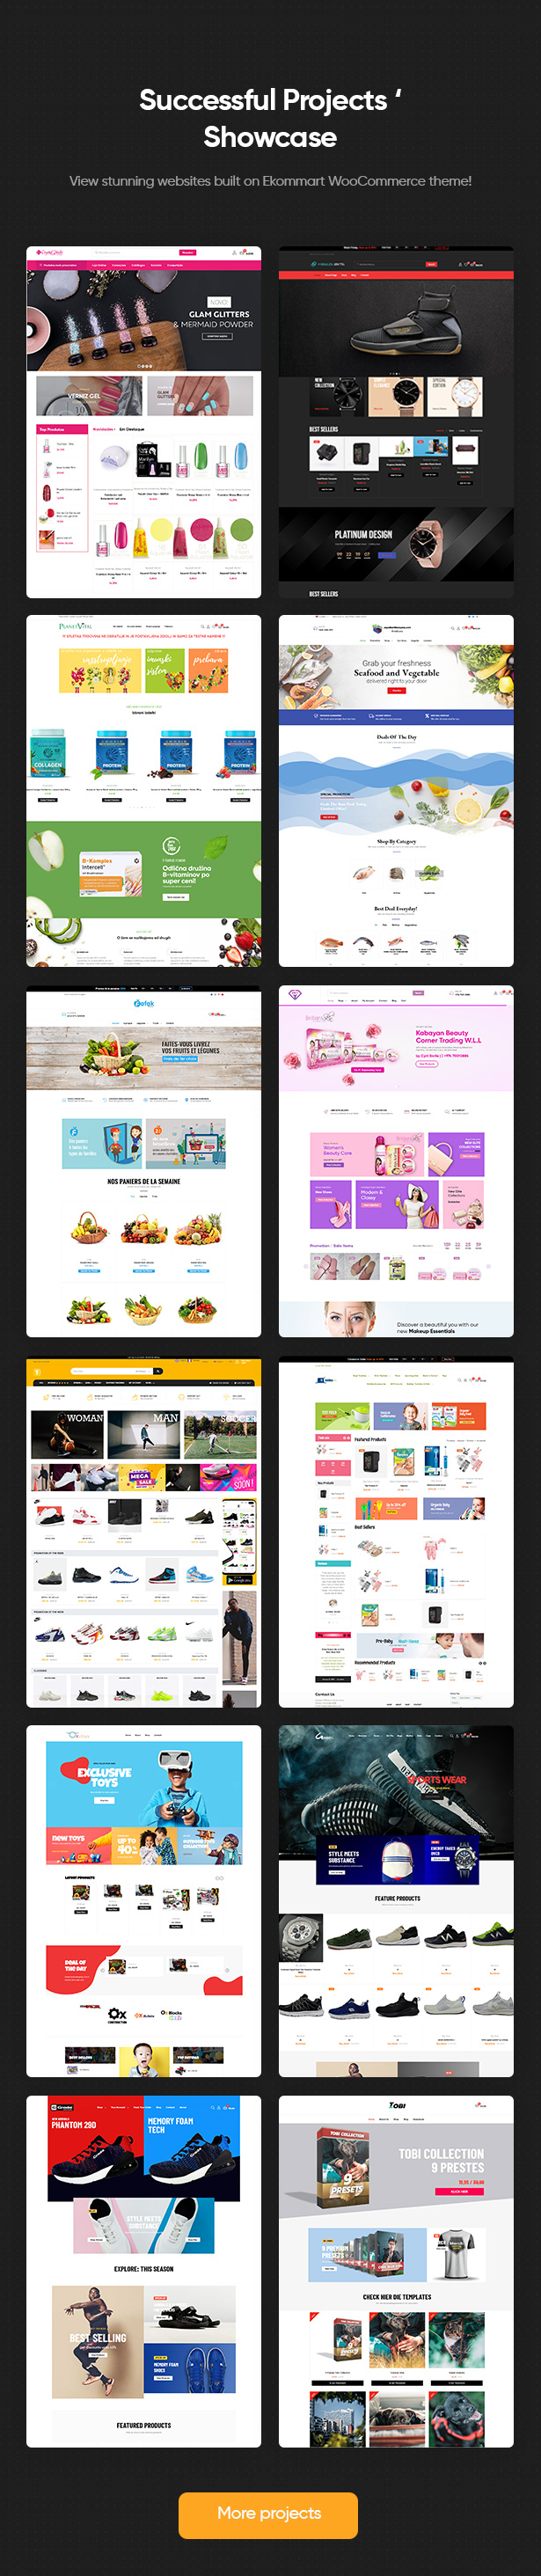 ekommart_customer_sites